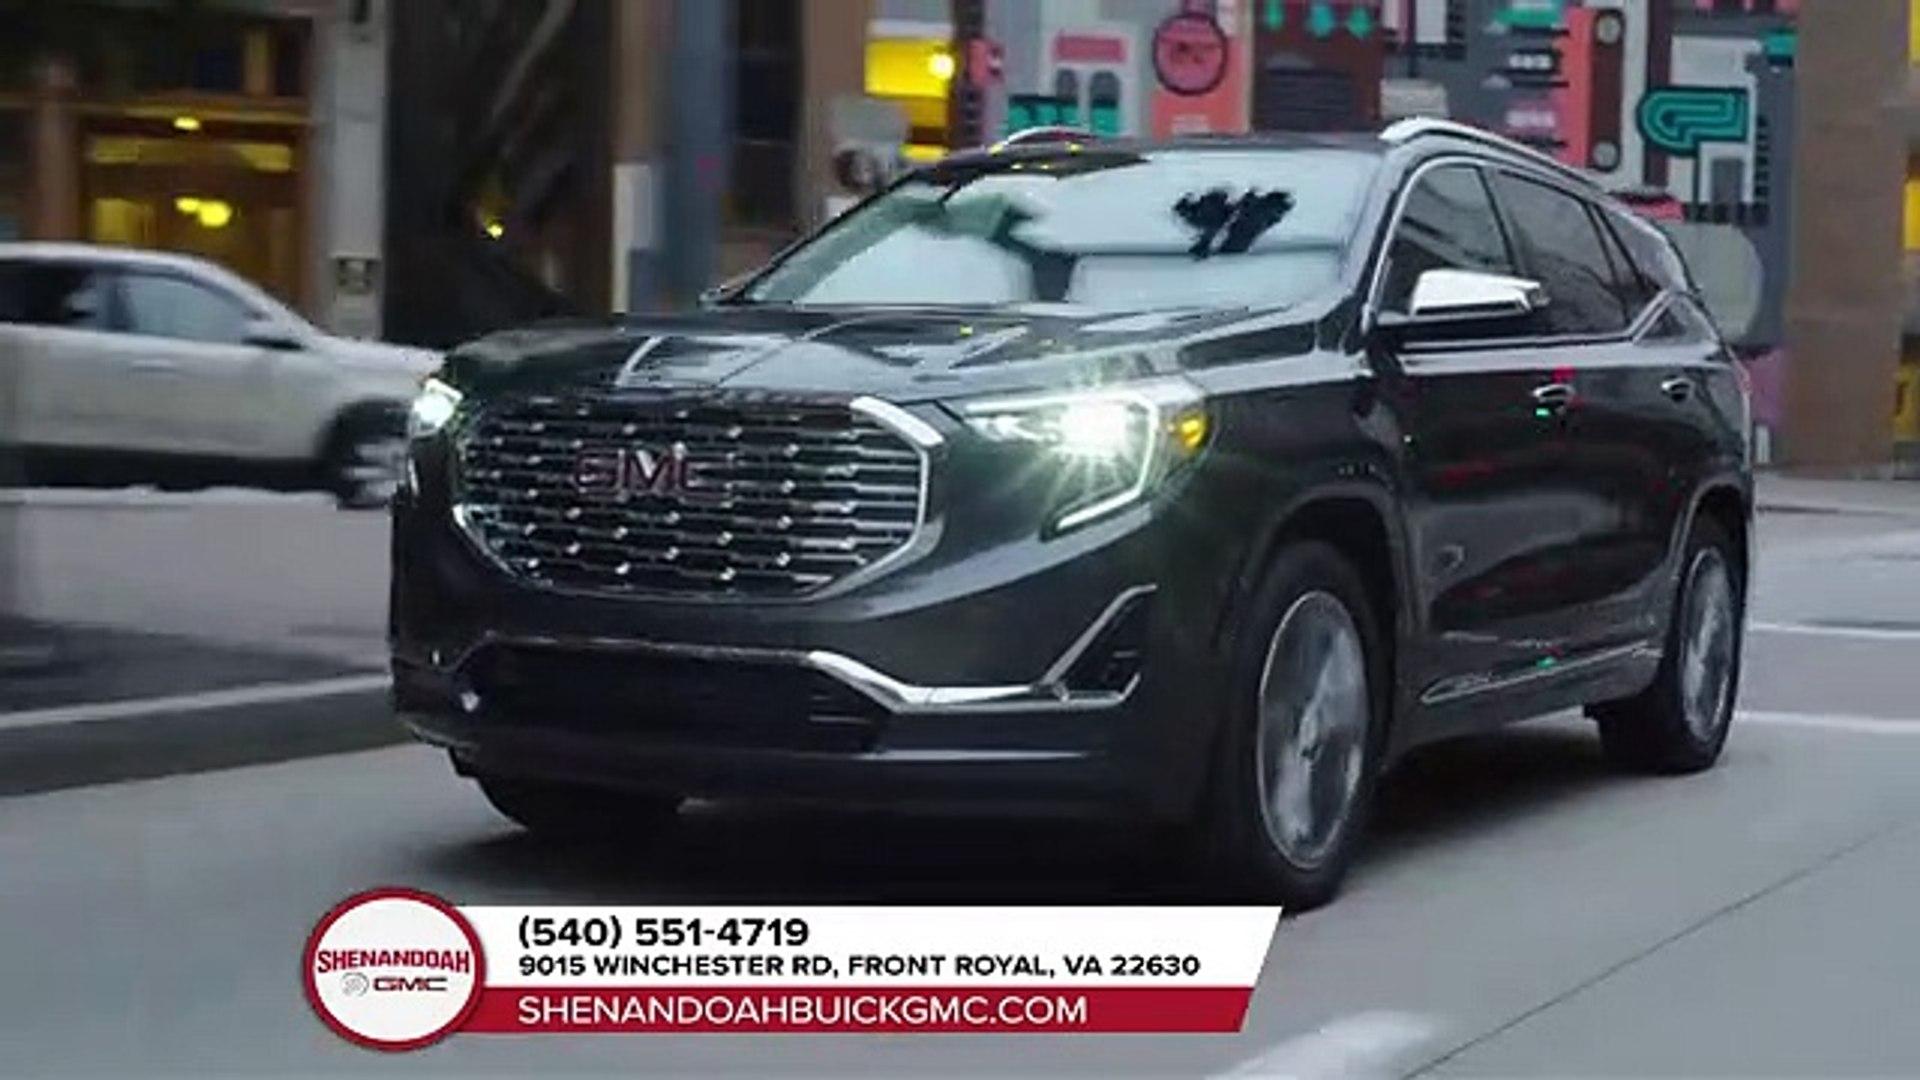 2018 GMC Terrain Front Royal VA | New GMC Terrain Front Royal VA